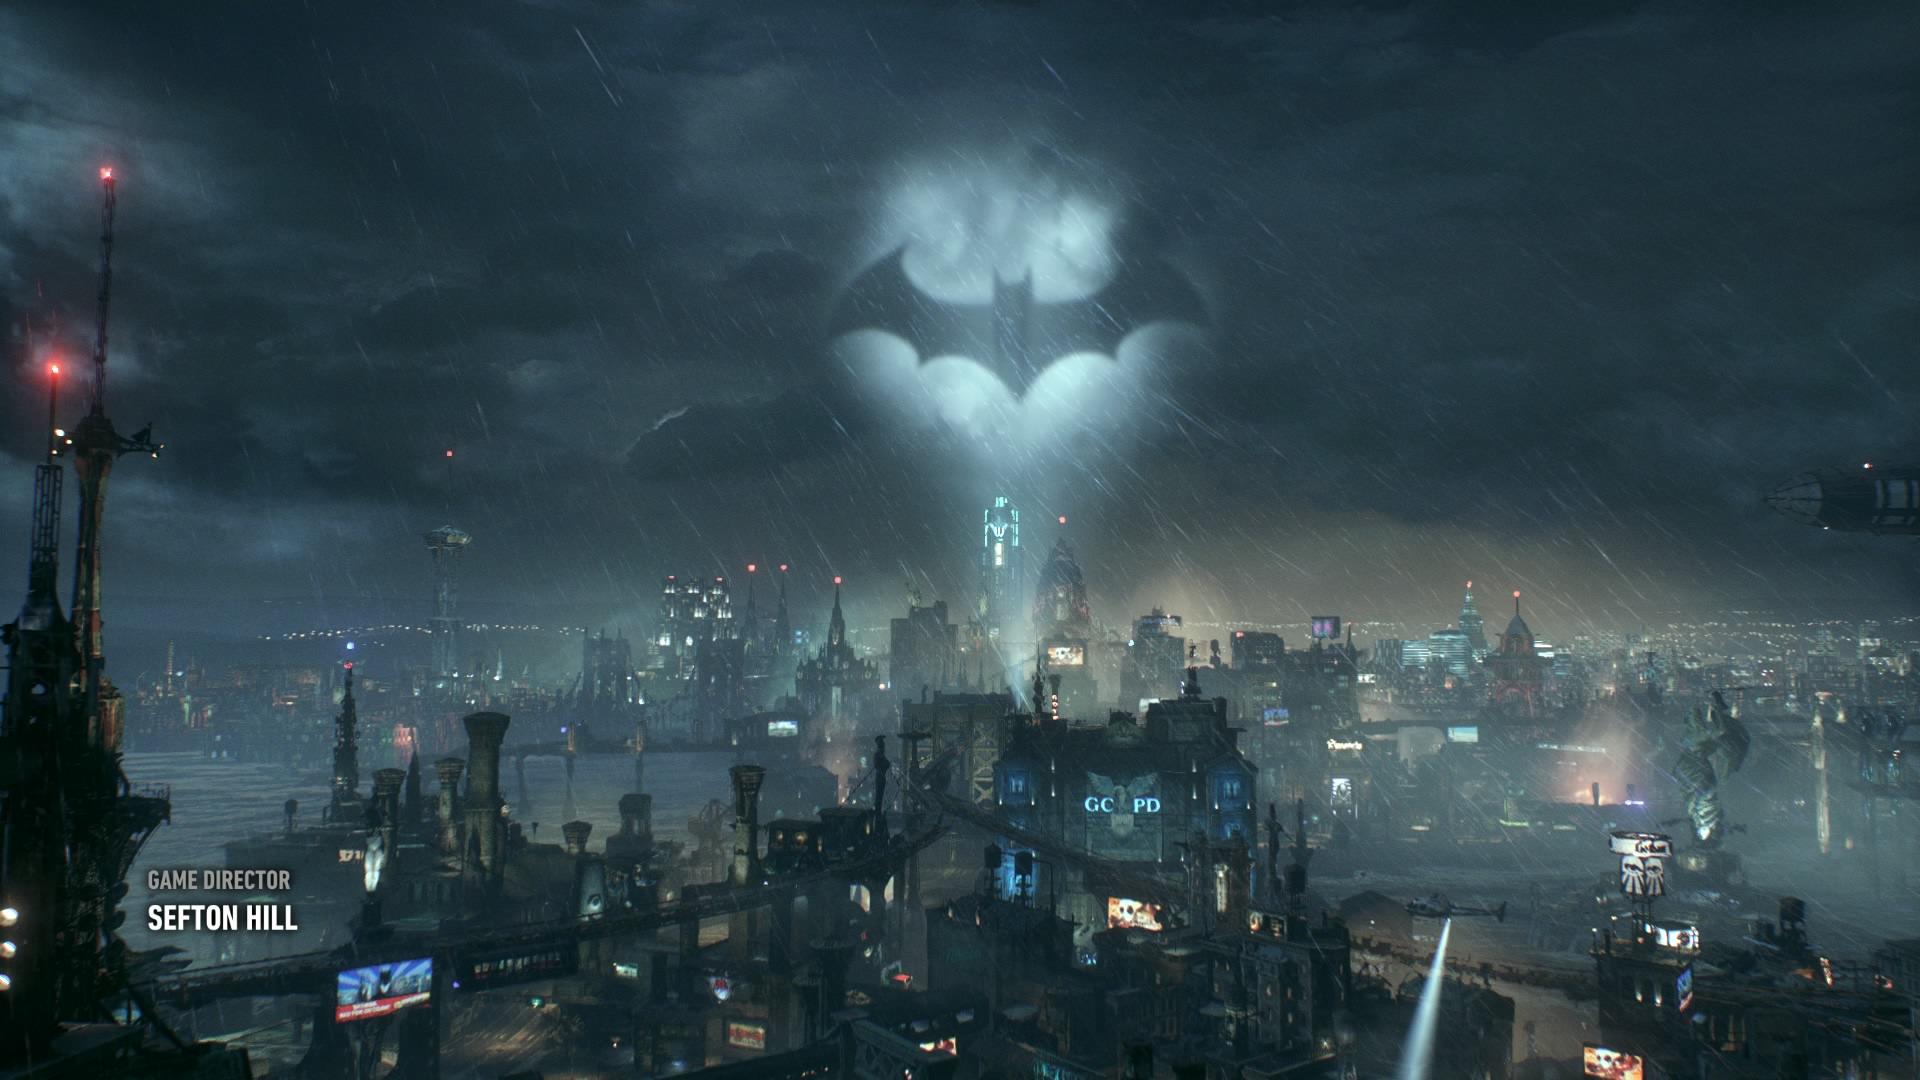 Recenze: Batman Arkham Knight – Strach nad Gothamem 10709